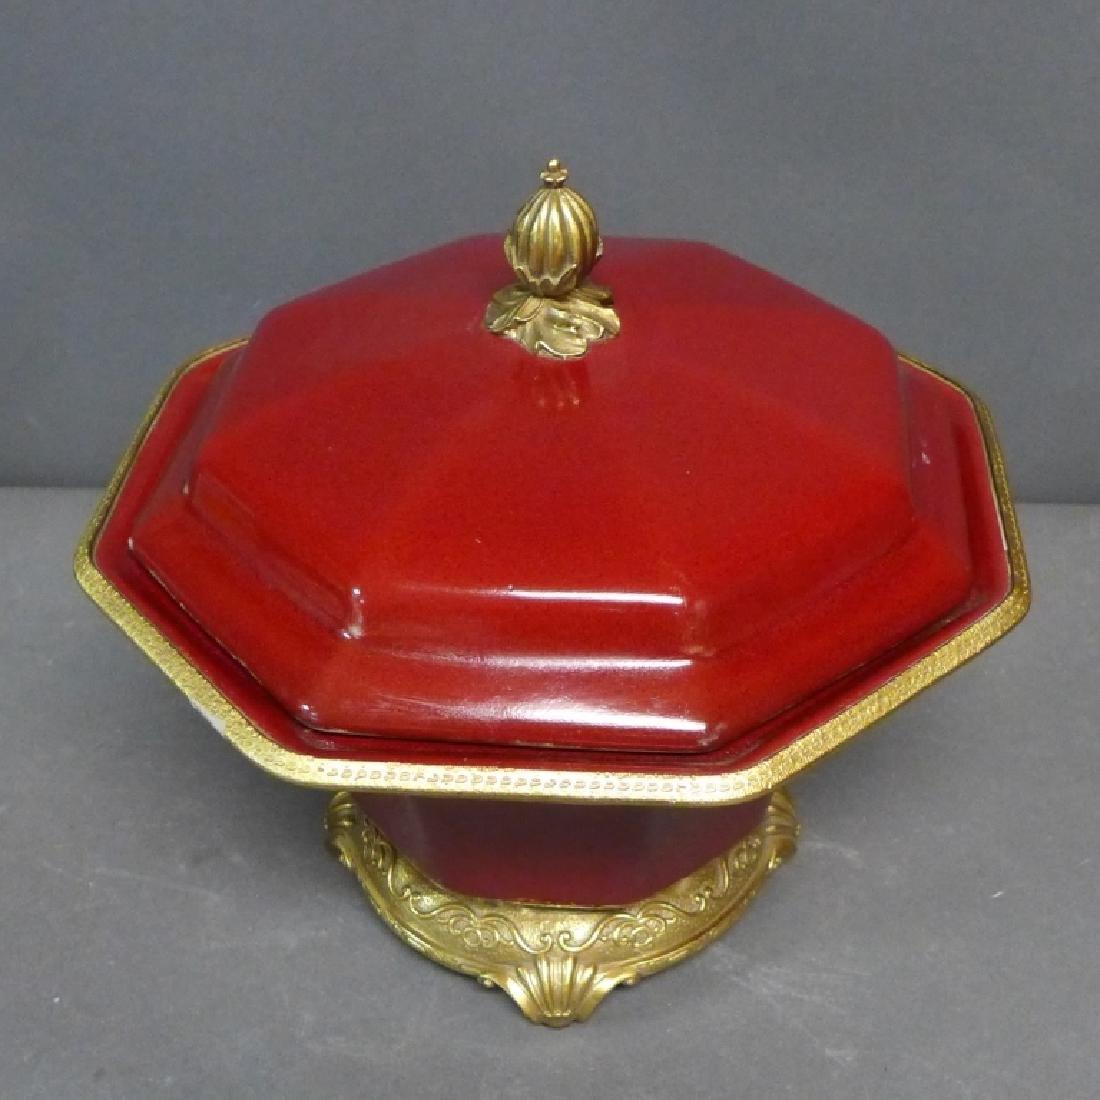 Bronze Mounted Flambe Pottery Centerpiece - 2